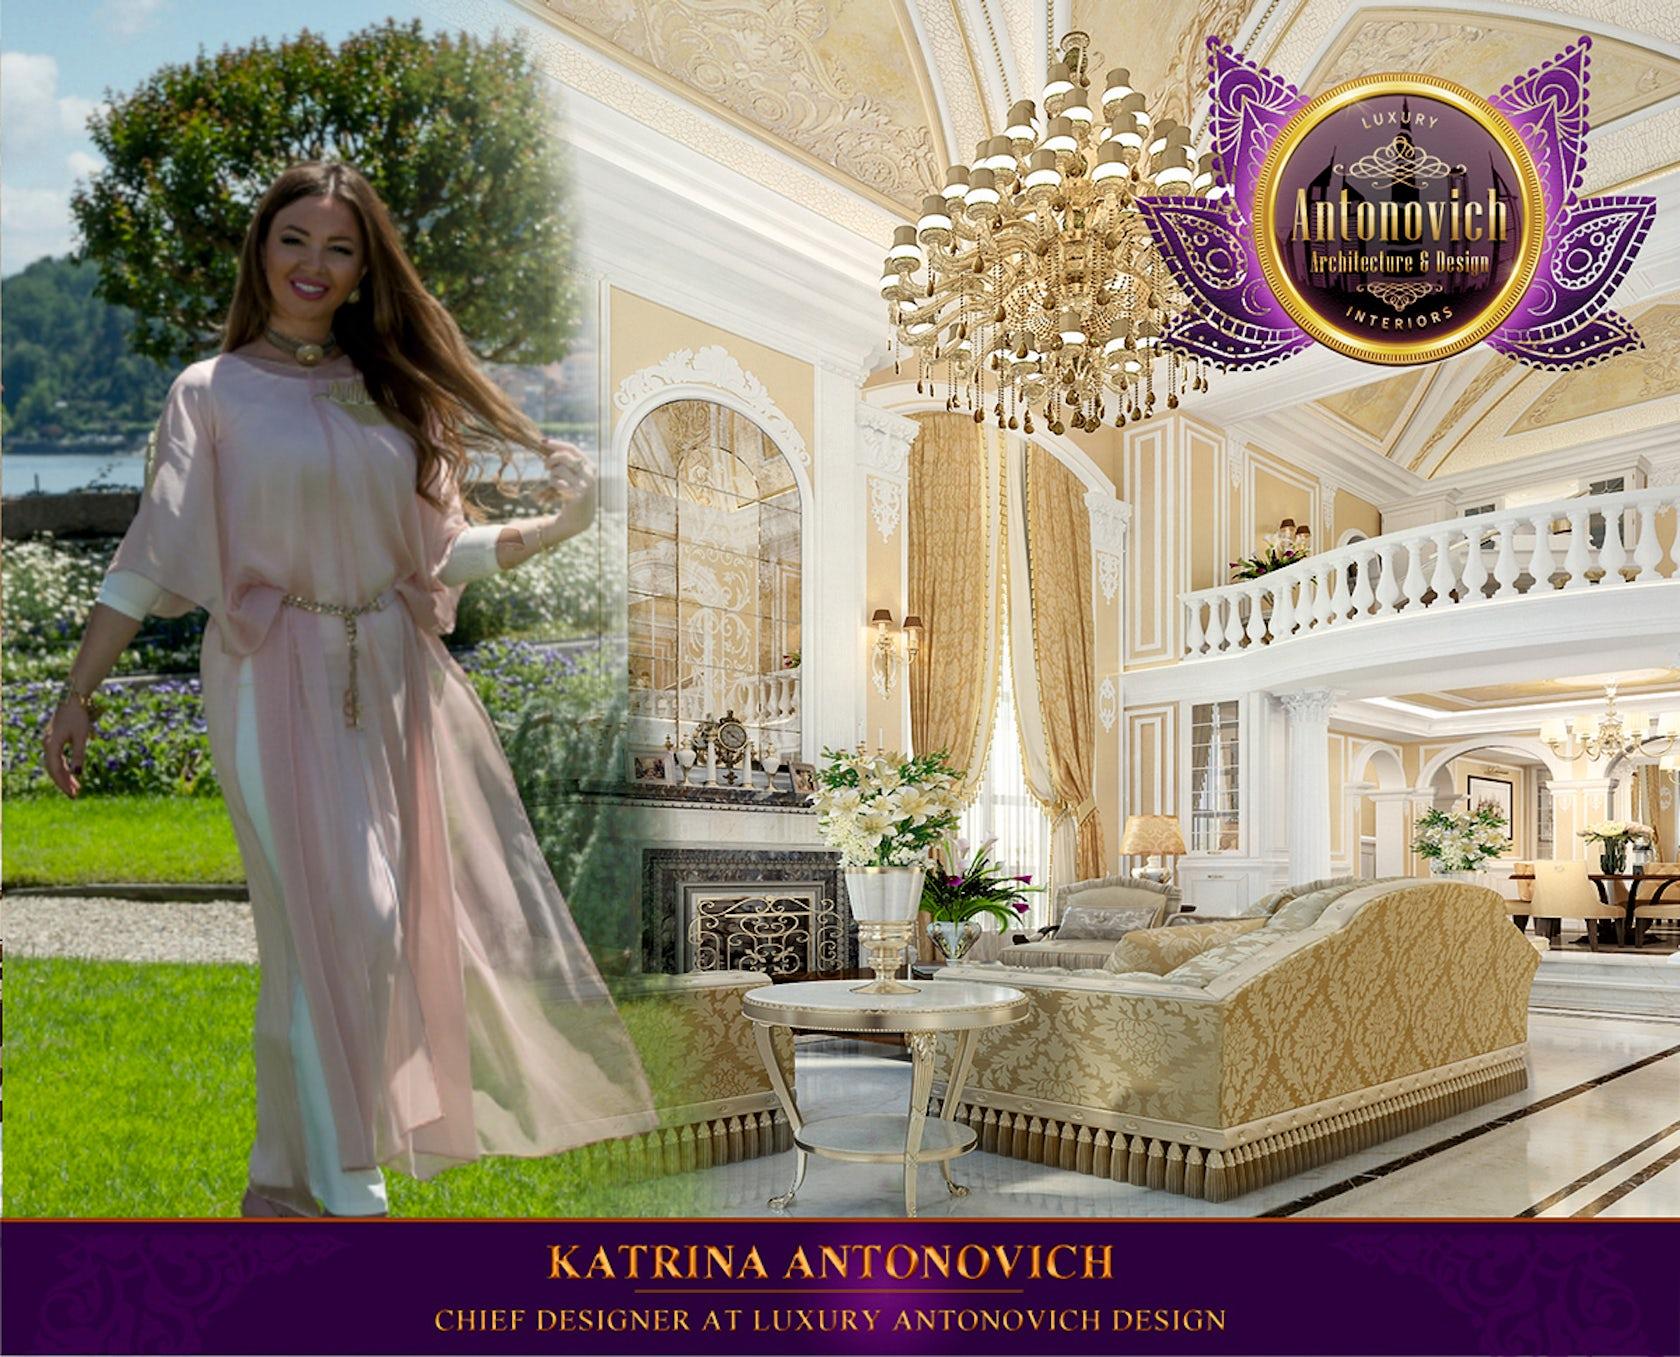 Villa design in runda area nairobi by luxury antonovich for Villa interior designers ltd nairobi kenya